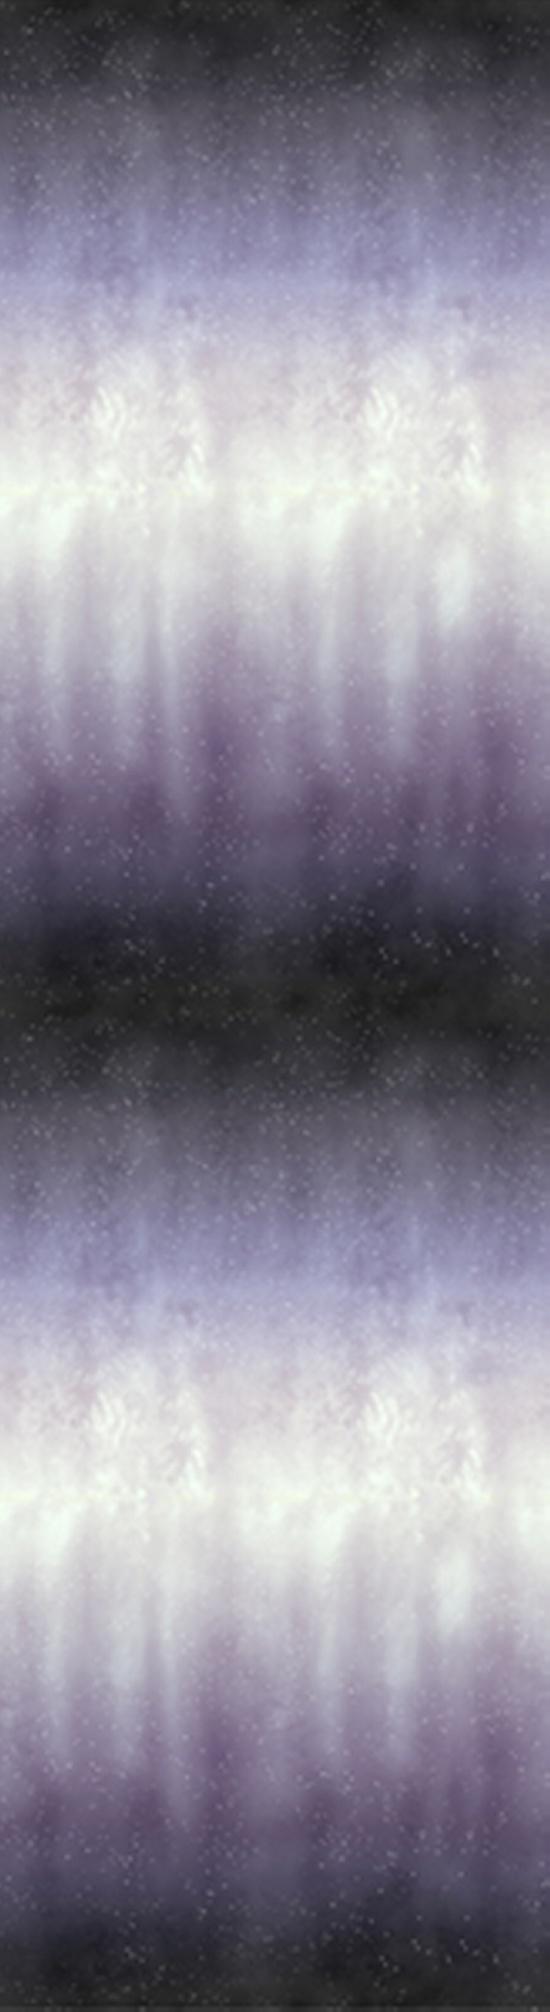 Painted Forest - Ombre Texture<br>Purple Haze - MRD6--535